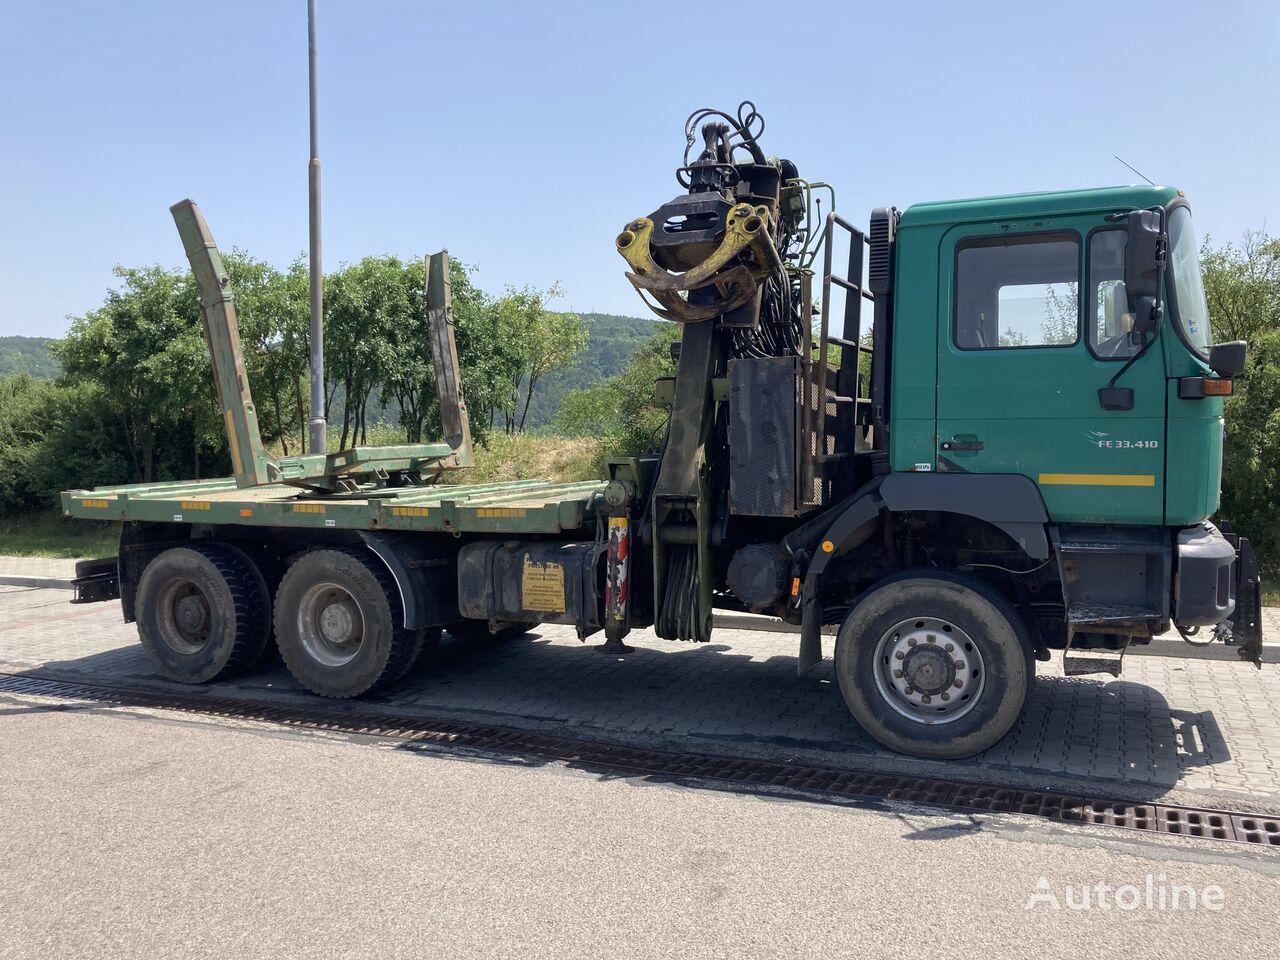 MAN F2000 33.410 !! One Kran !!! timber truck